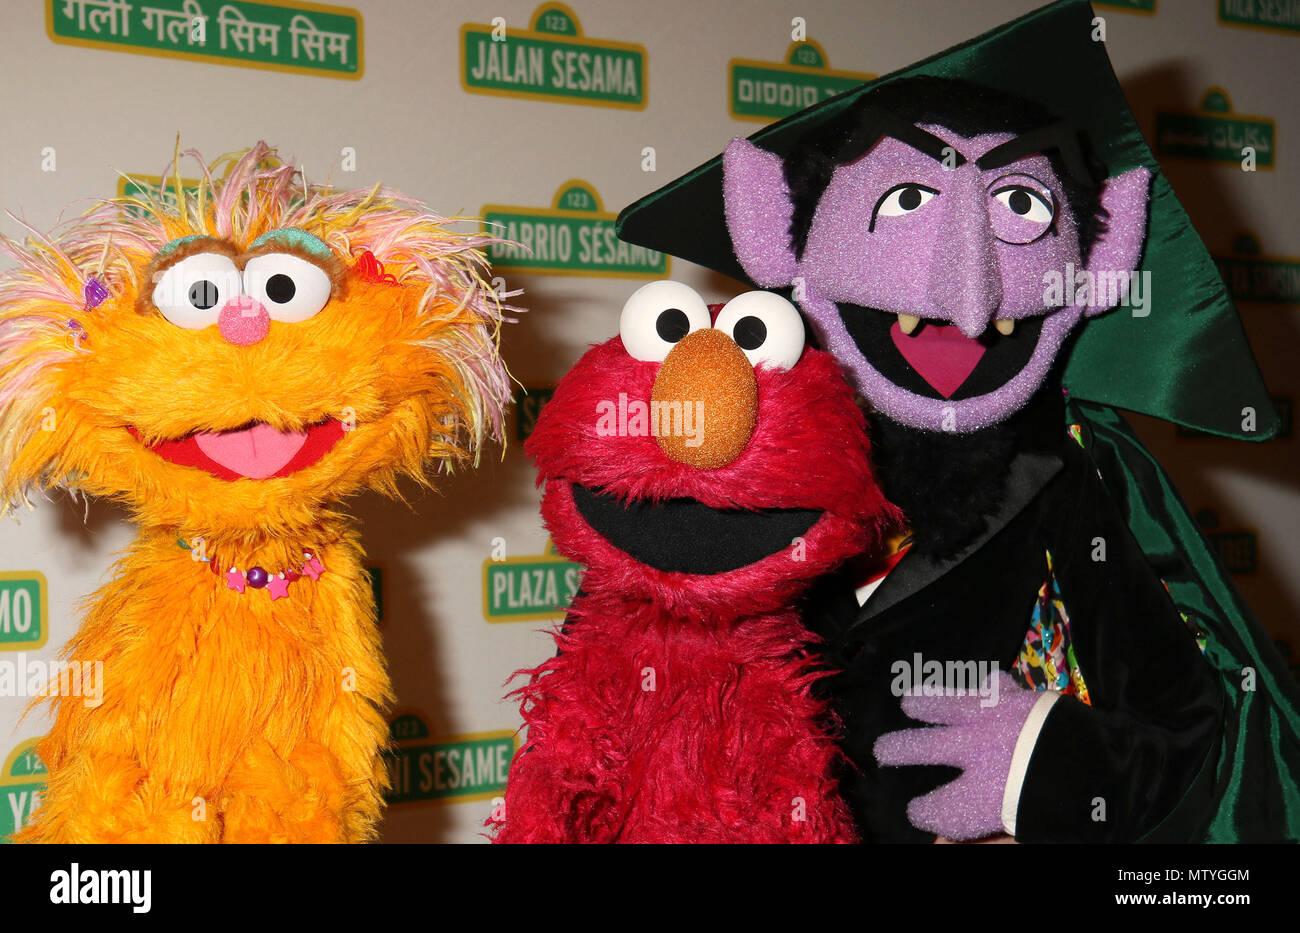 Sesame Street Characters Stock Photos Sesame Street